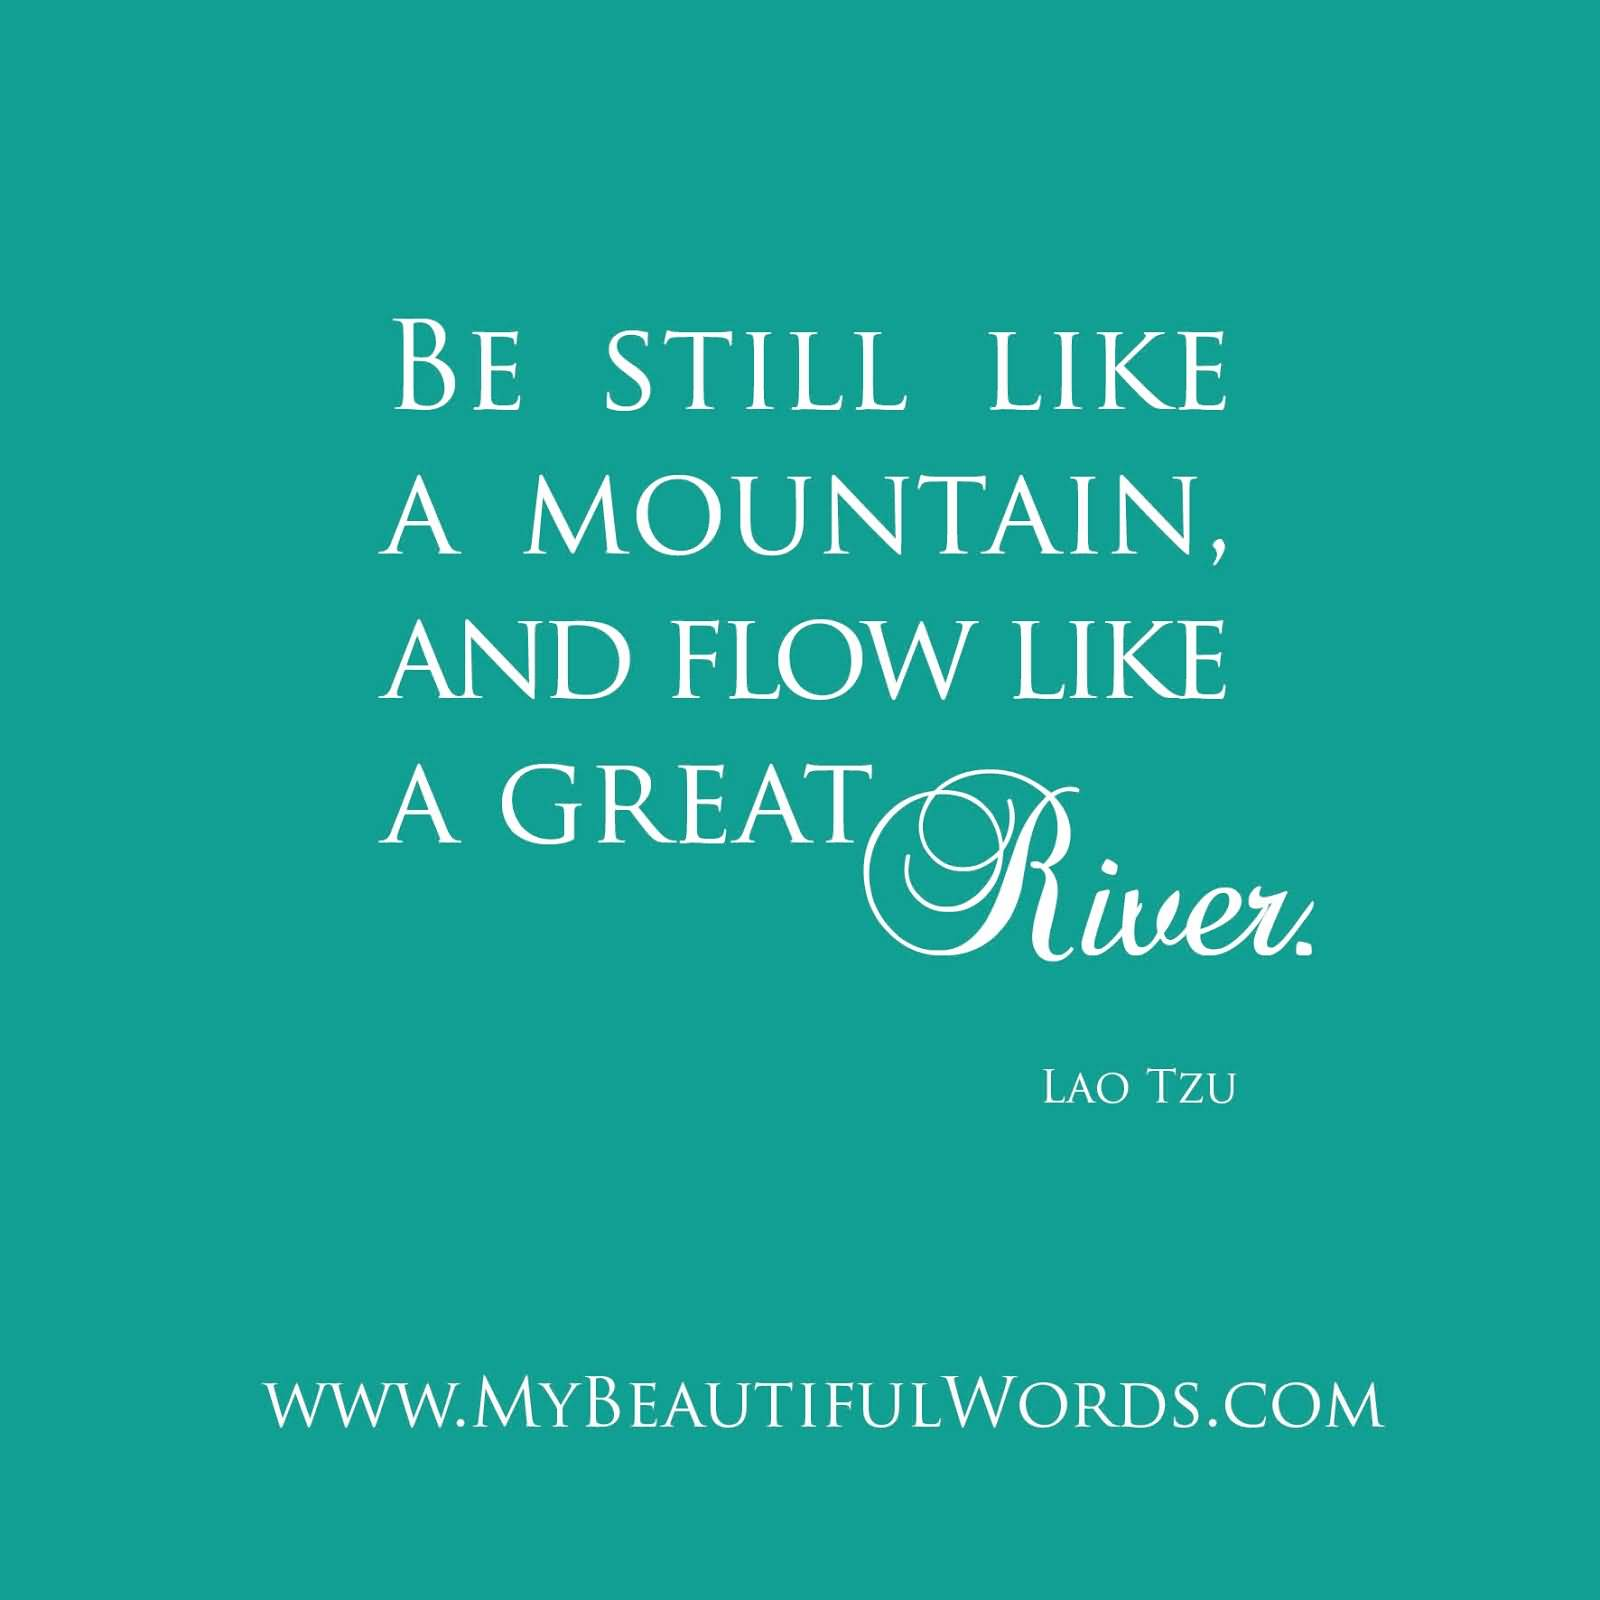 Lao Tzu Quotes Life Lao Tzu Quotes Life 04  Quotesbae